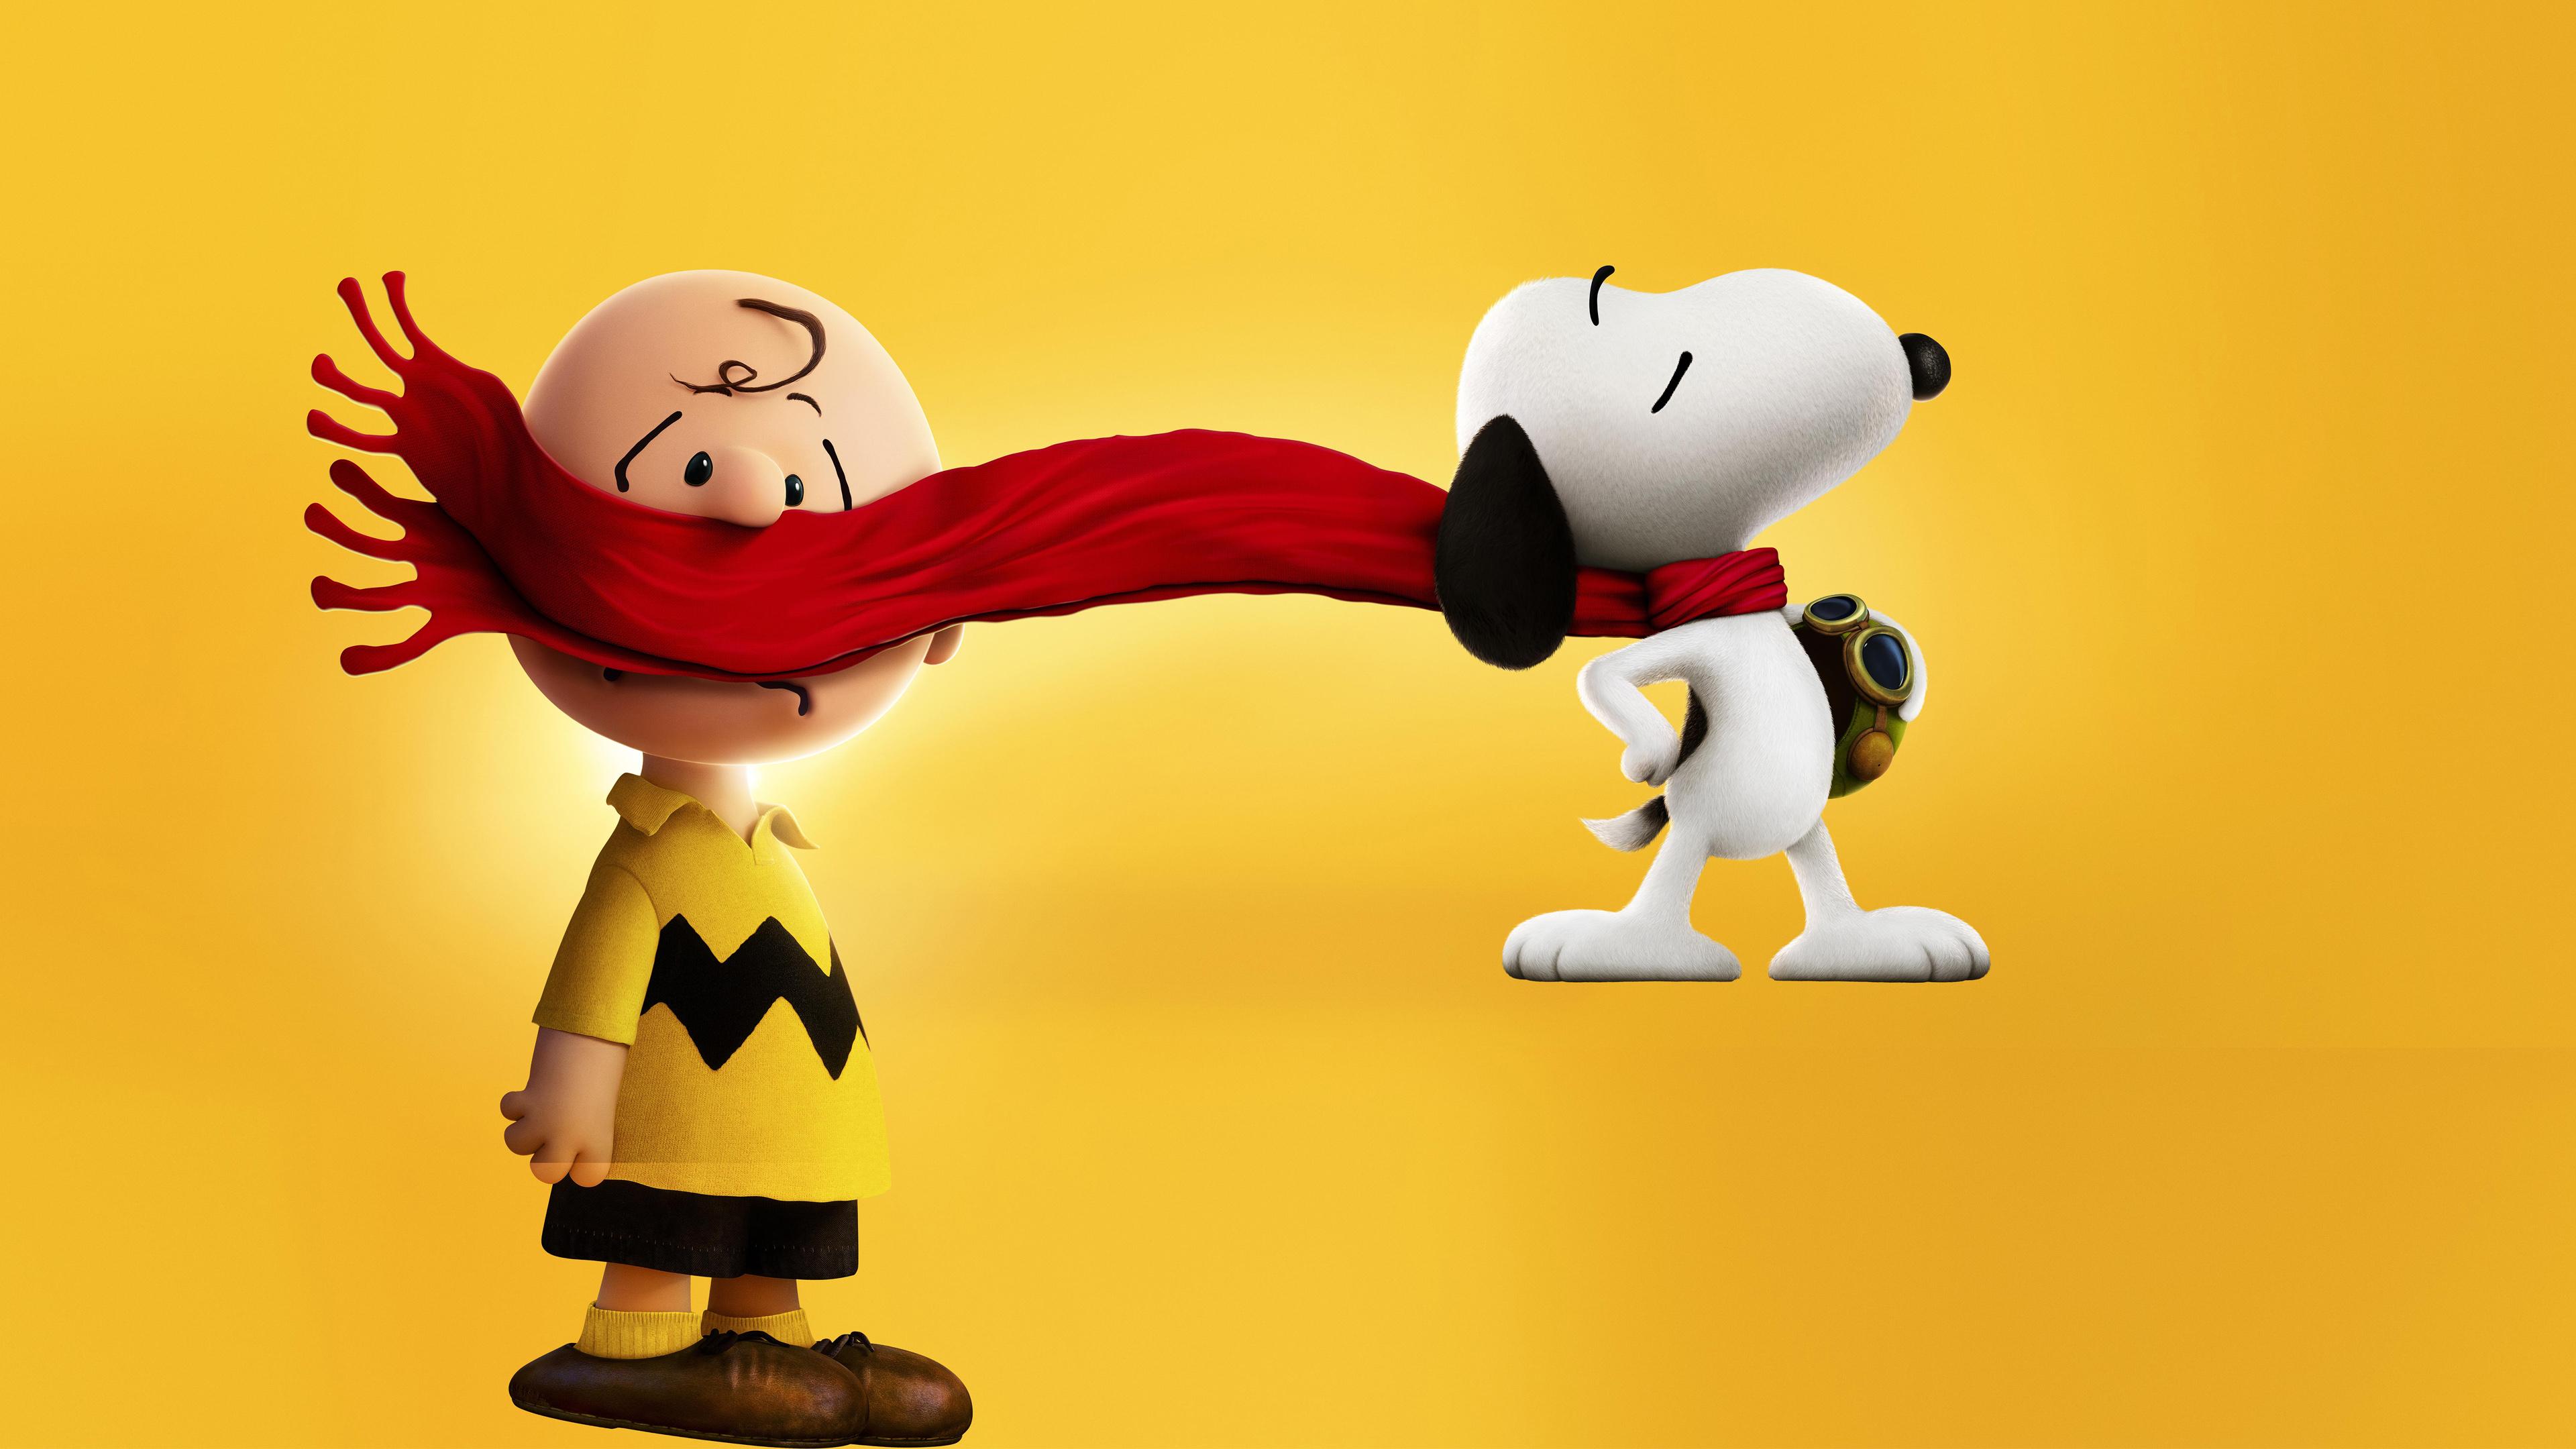 Desktop Snoopy HD Wallpapers 3840x2160